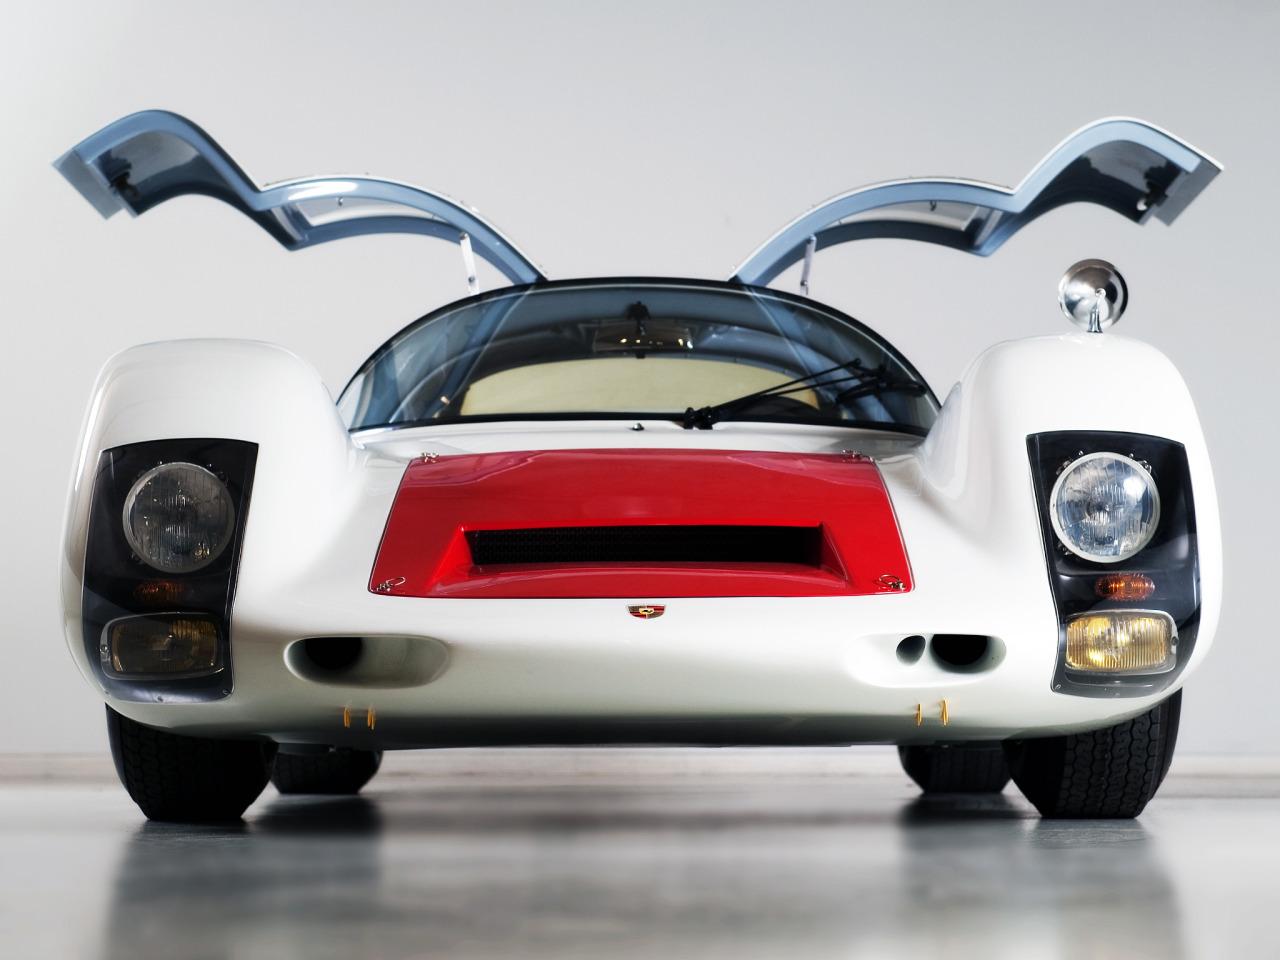 1966 Porsche 906 Carrera 6 Kurzheck Coupe